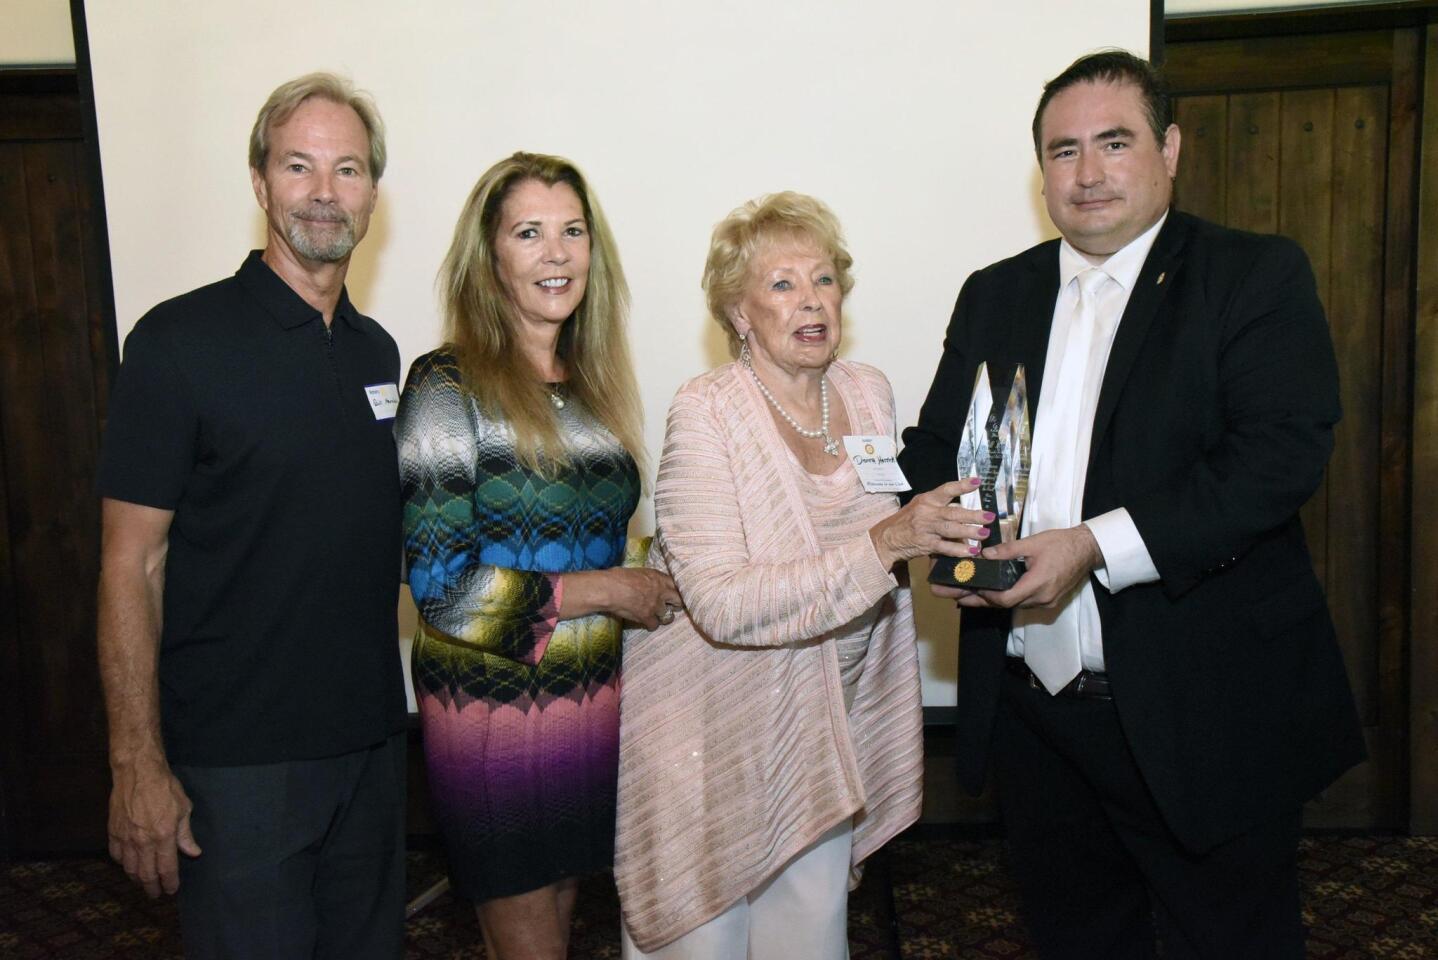 Son Bill Herrick, daughter Leann Herrick-VanLangan, and Donna Herrick are presented a posthumous award by President Luis Carranza, honoring the generosity and work of the late Bill Herrick